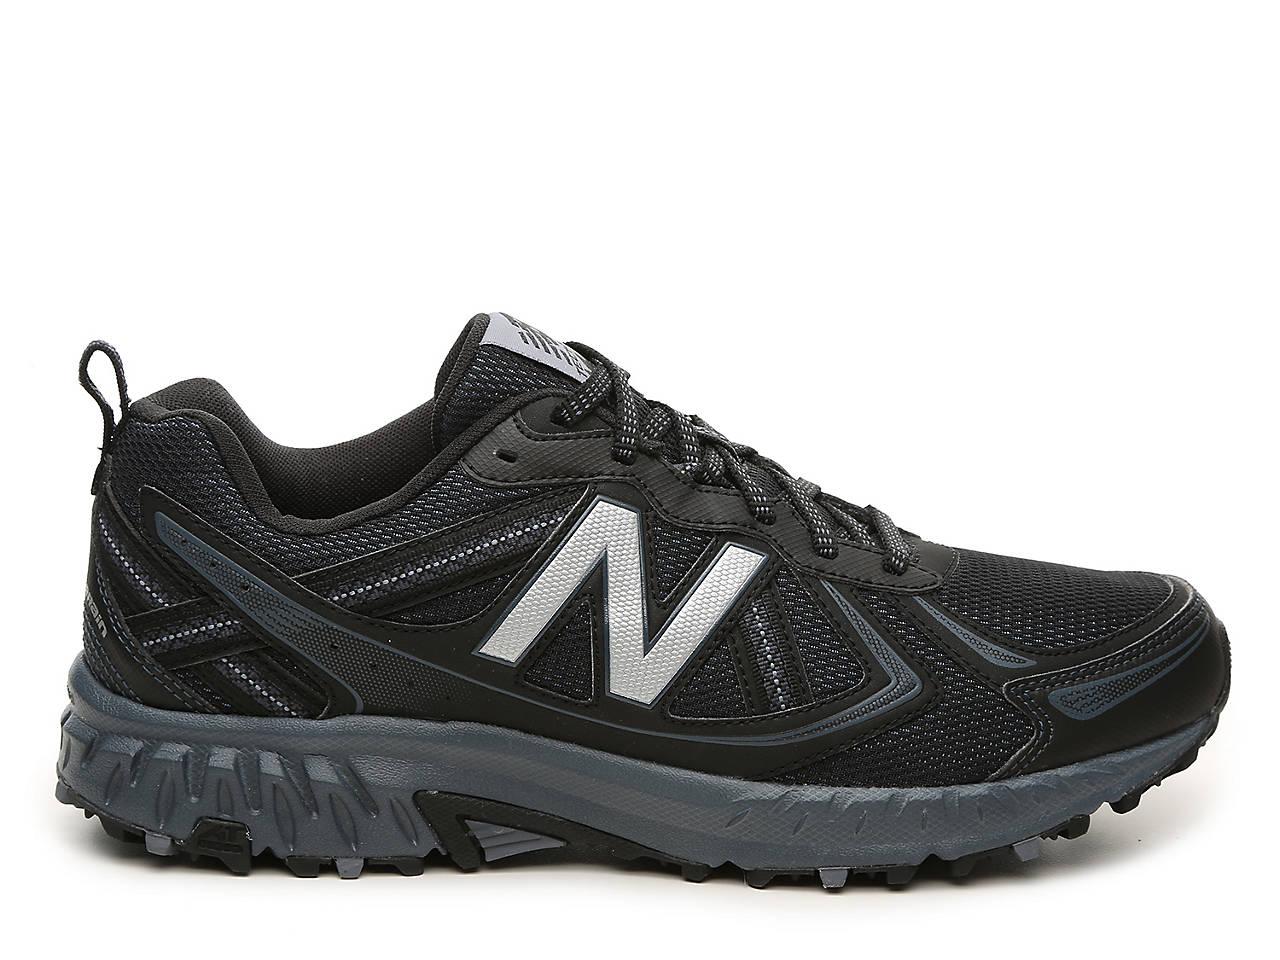 6dc247f8d76c2 New Balance 410 v5 Trail Running Shoe - Men's Men's Shoes | DSW